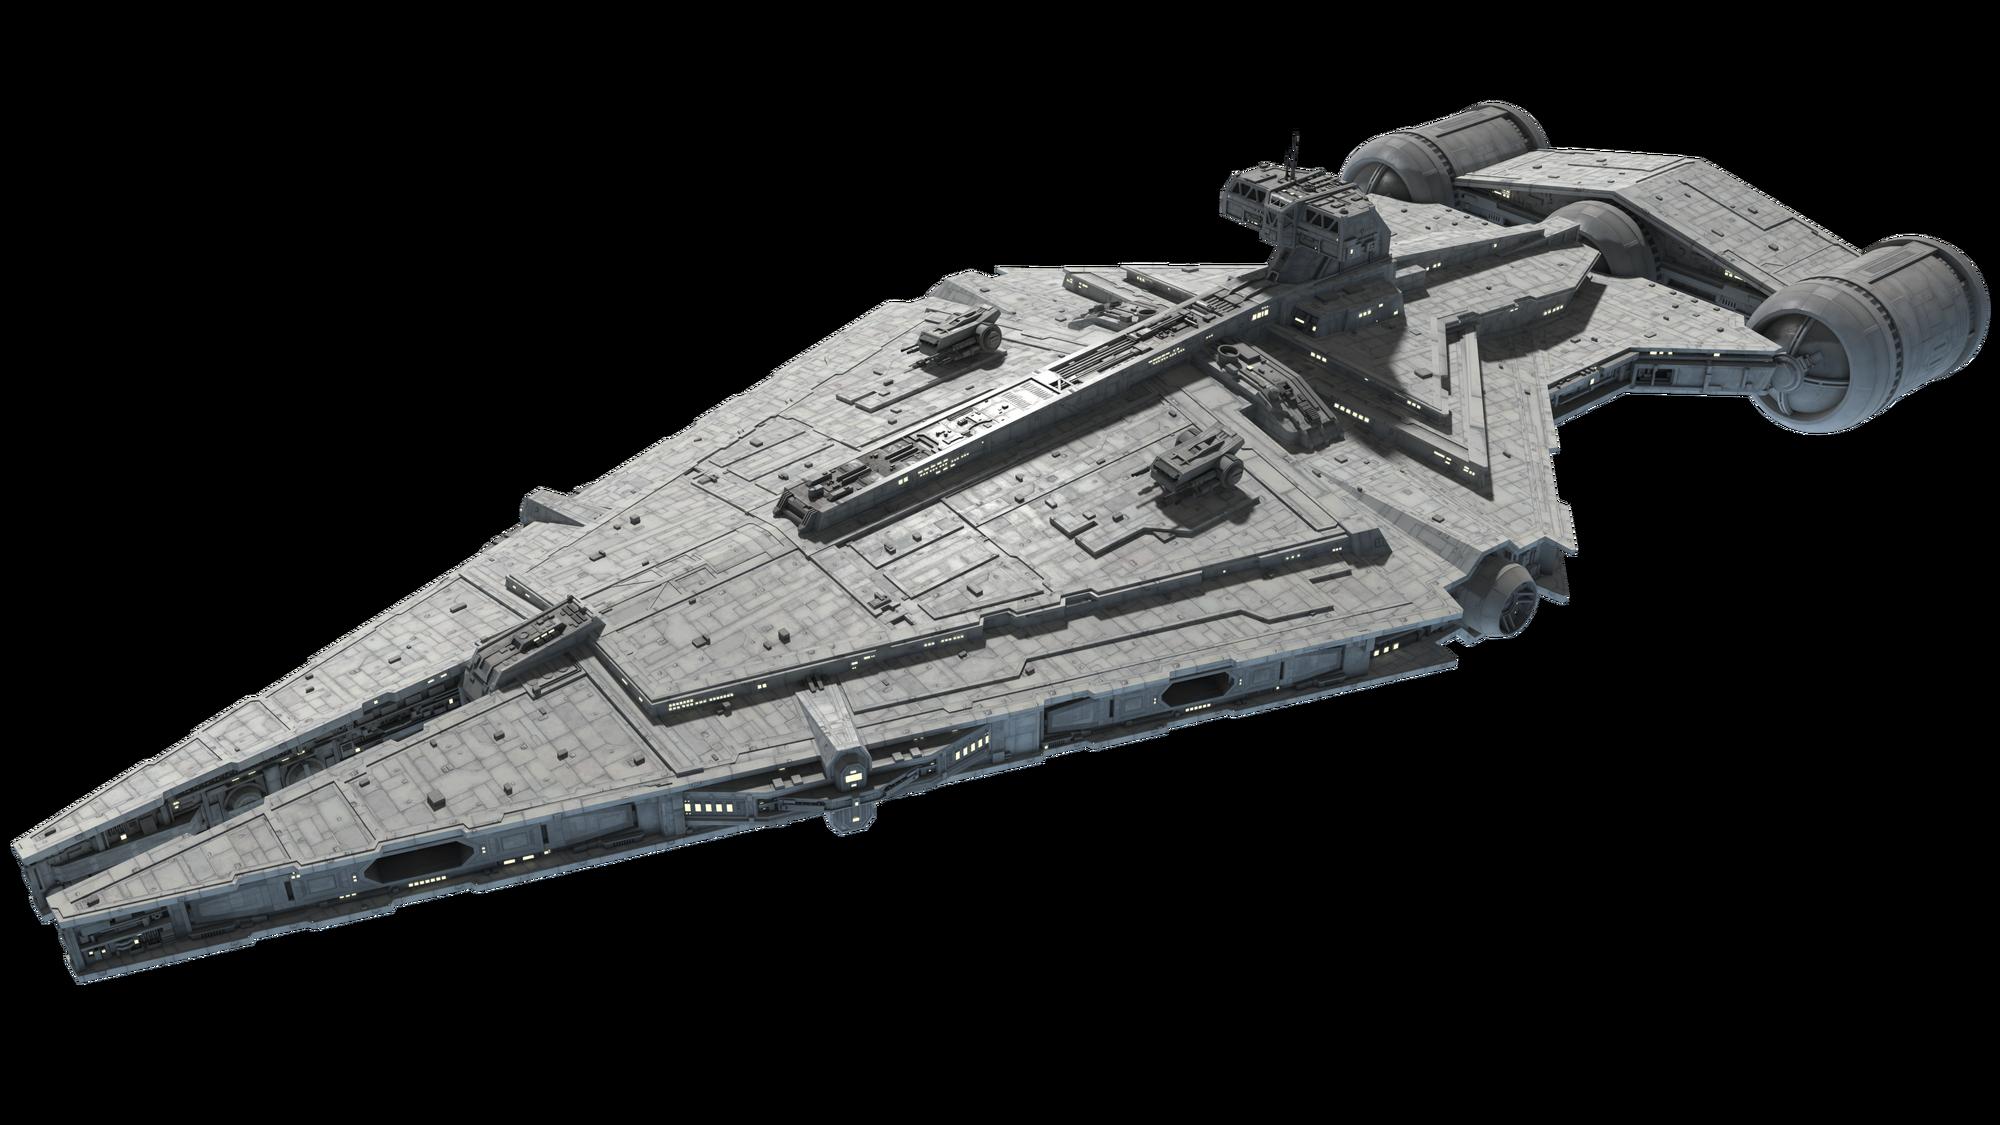 Arquitens class command cruiser wookieepedia fandom - Croiseur star wars lego ...